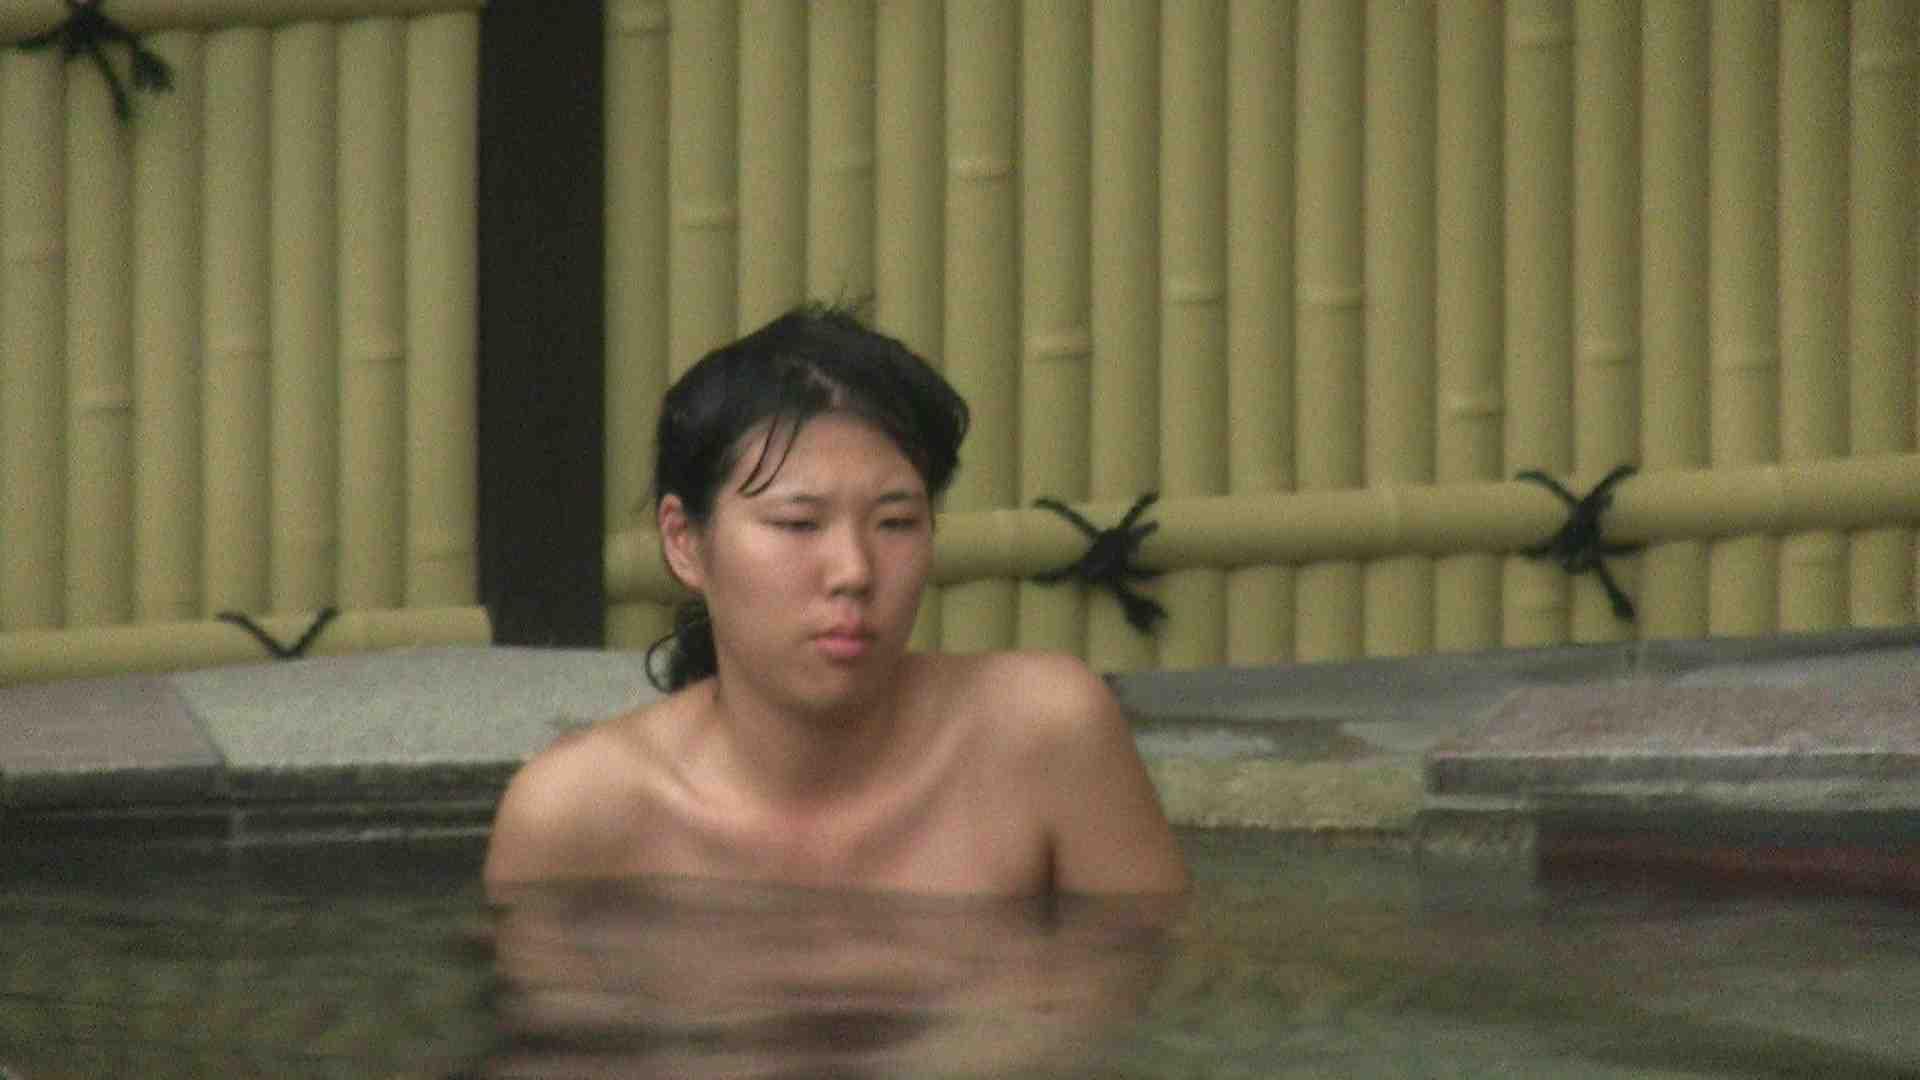 Aquaな露天風呂Vol.215 露天  74連発 66